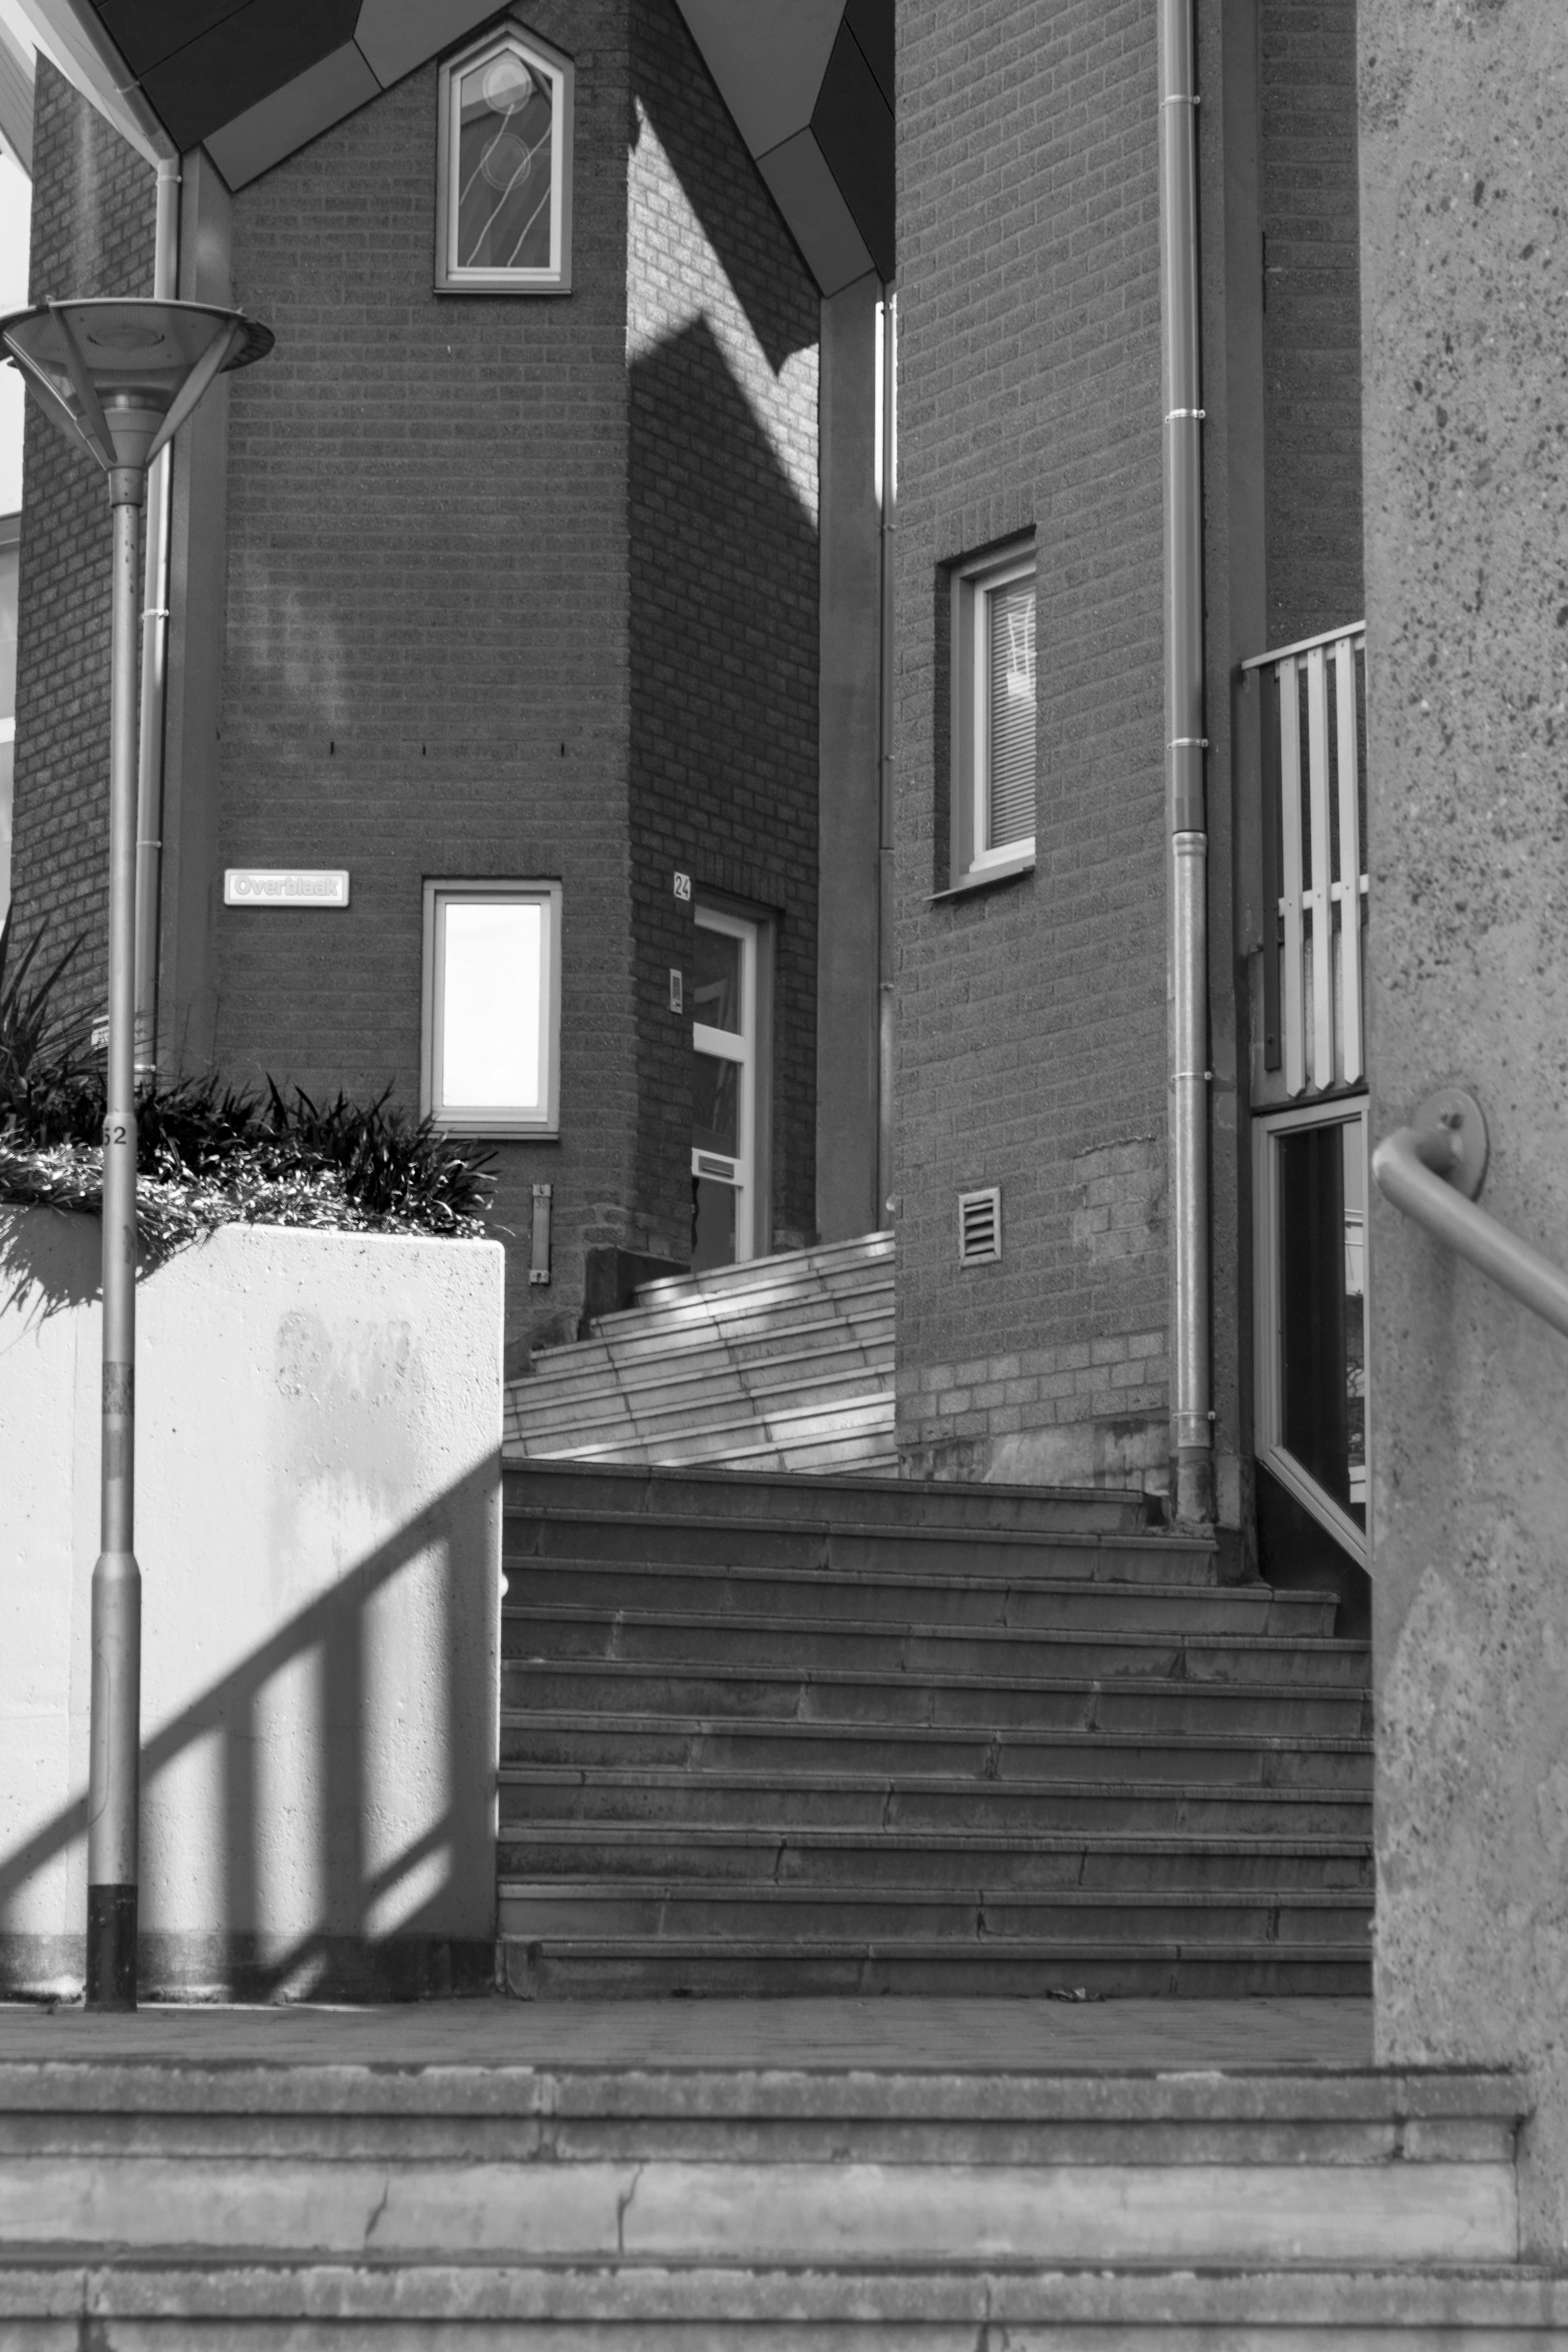 https://get.pxhere.com/photo/outdoor-black-and-white-architecture-road-white-street-house-window-alley-home-urban-wall-facade-nikon-black-monochrome-lane-lighting-nederland-netherlands-rotterdam-infrastructure-outdoorphotography-photograph-urbanphotography-shape-paulvandevelde-pdvandevelde-padagudaloma-dordrecht-stadsfotografie-nederlandinfotos-blaak-kubuswoning-cubehouses-urban-area-monochrome-photography-386430.jpg